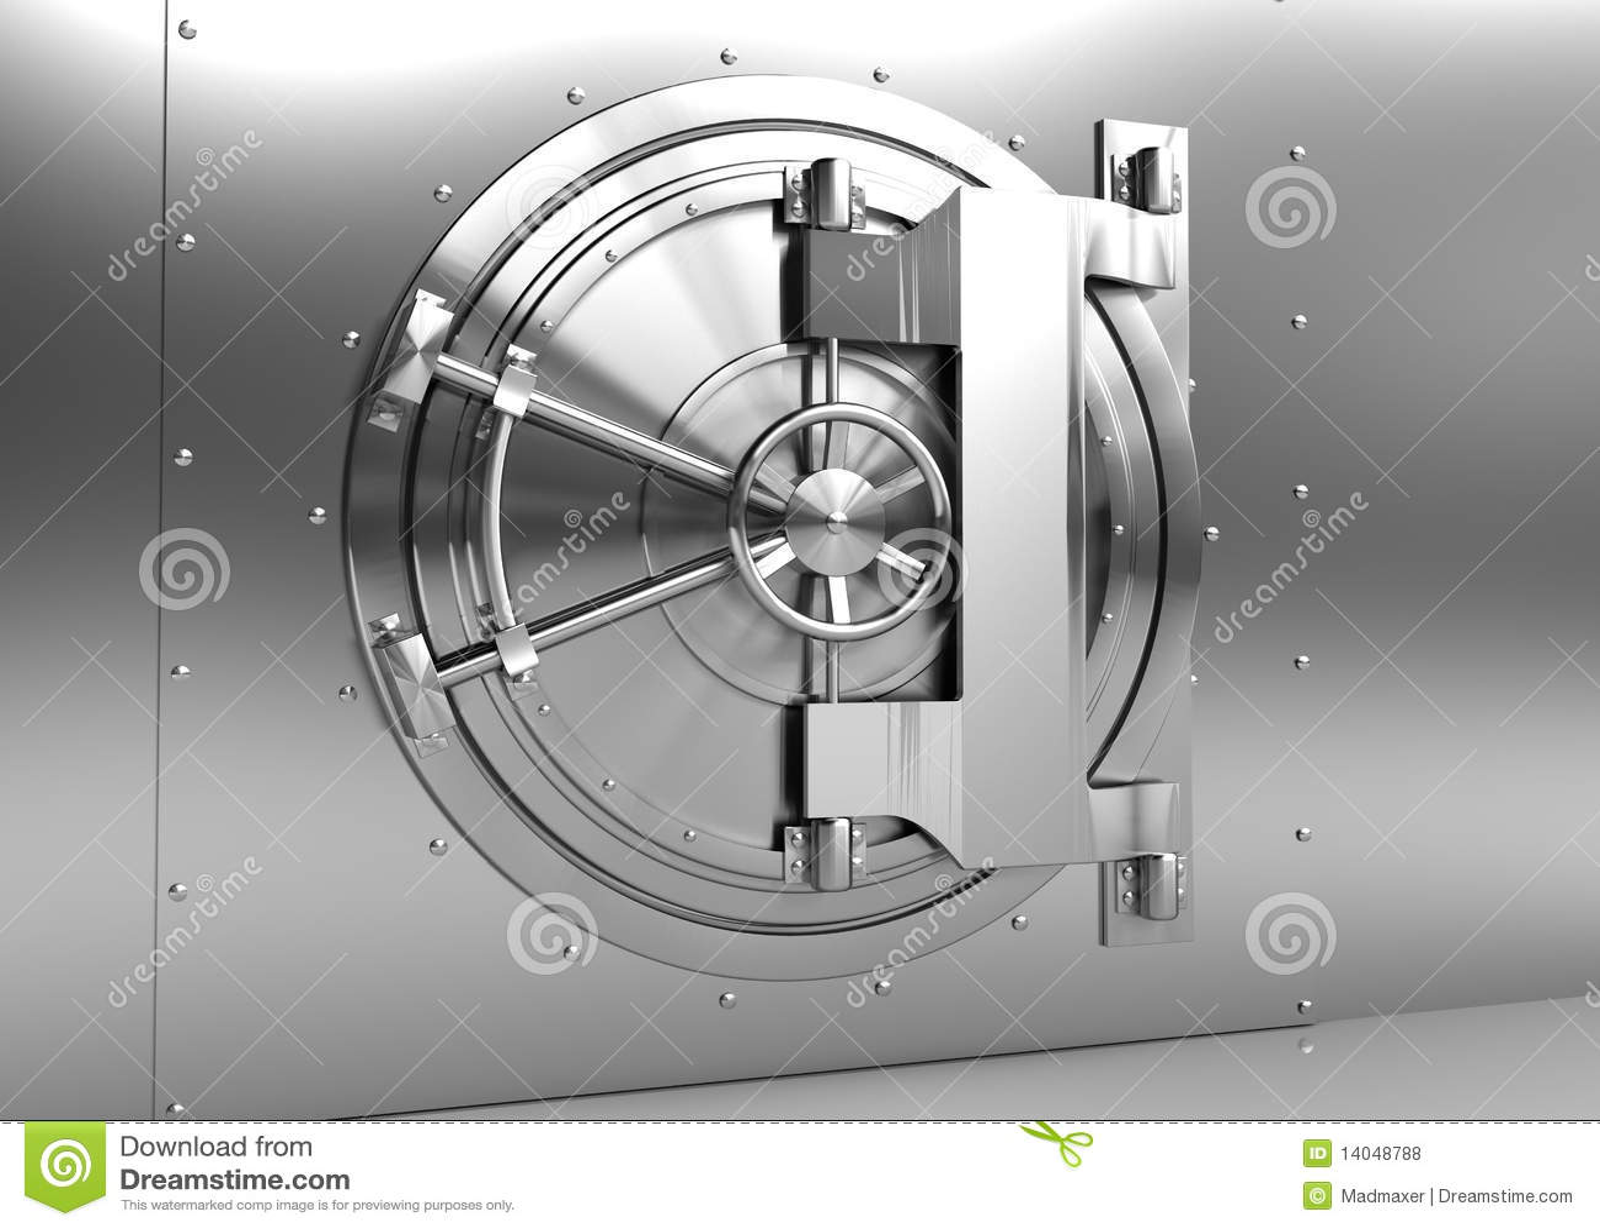 Vault Door Royalty Free Stock Photos Image 14048788